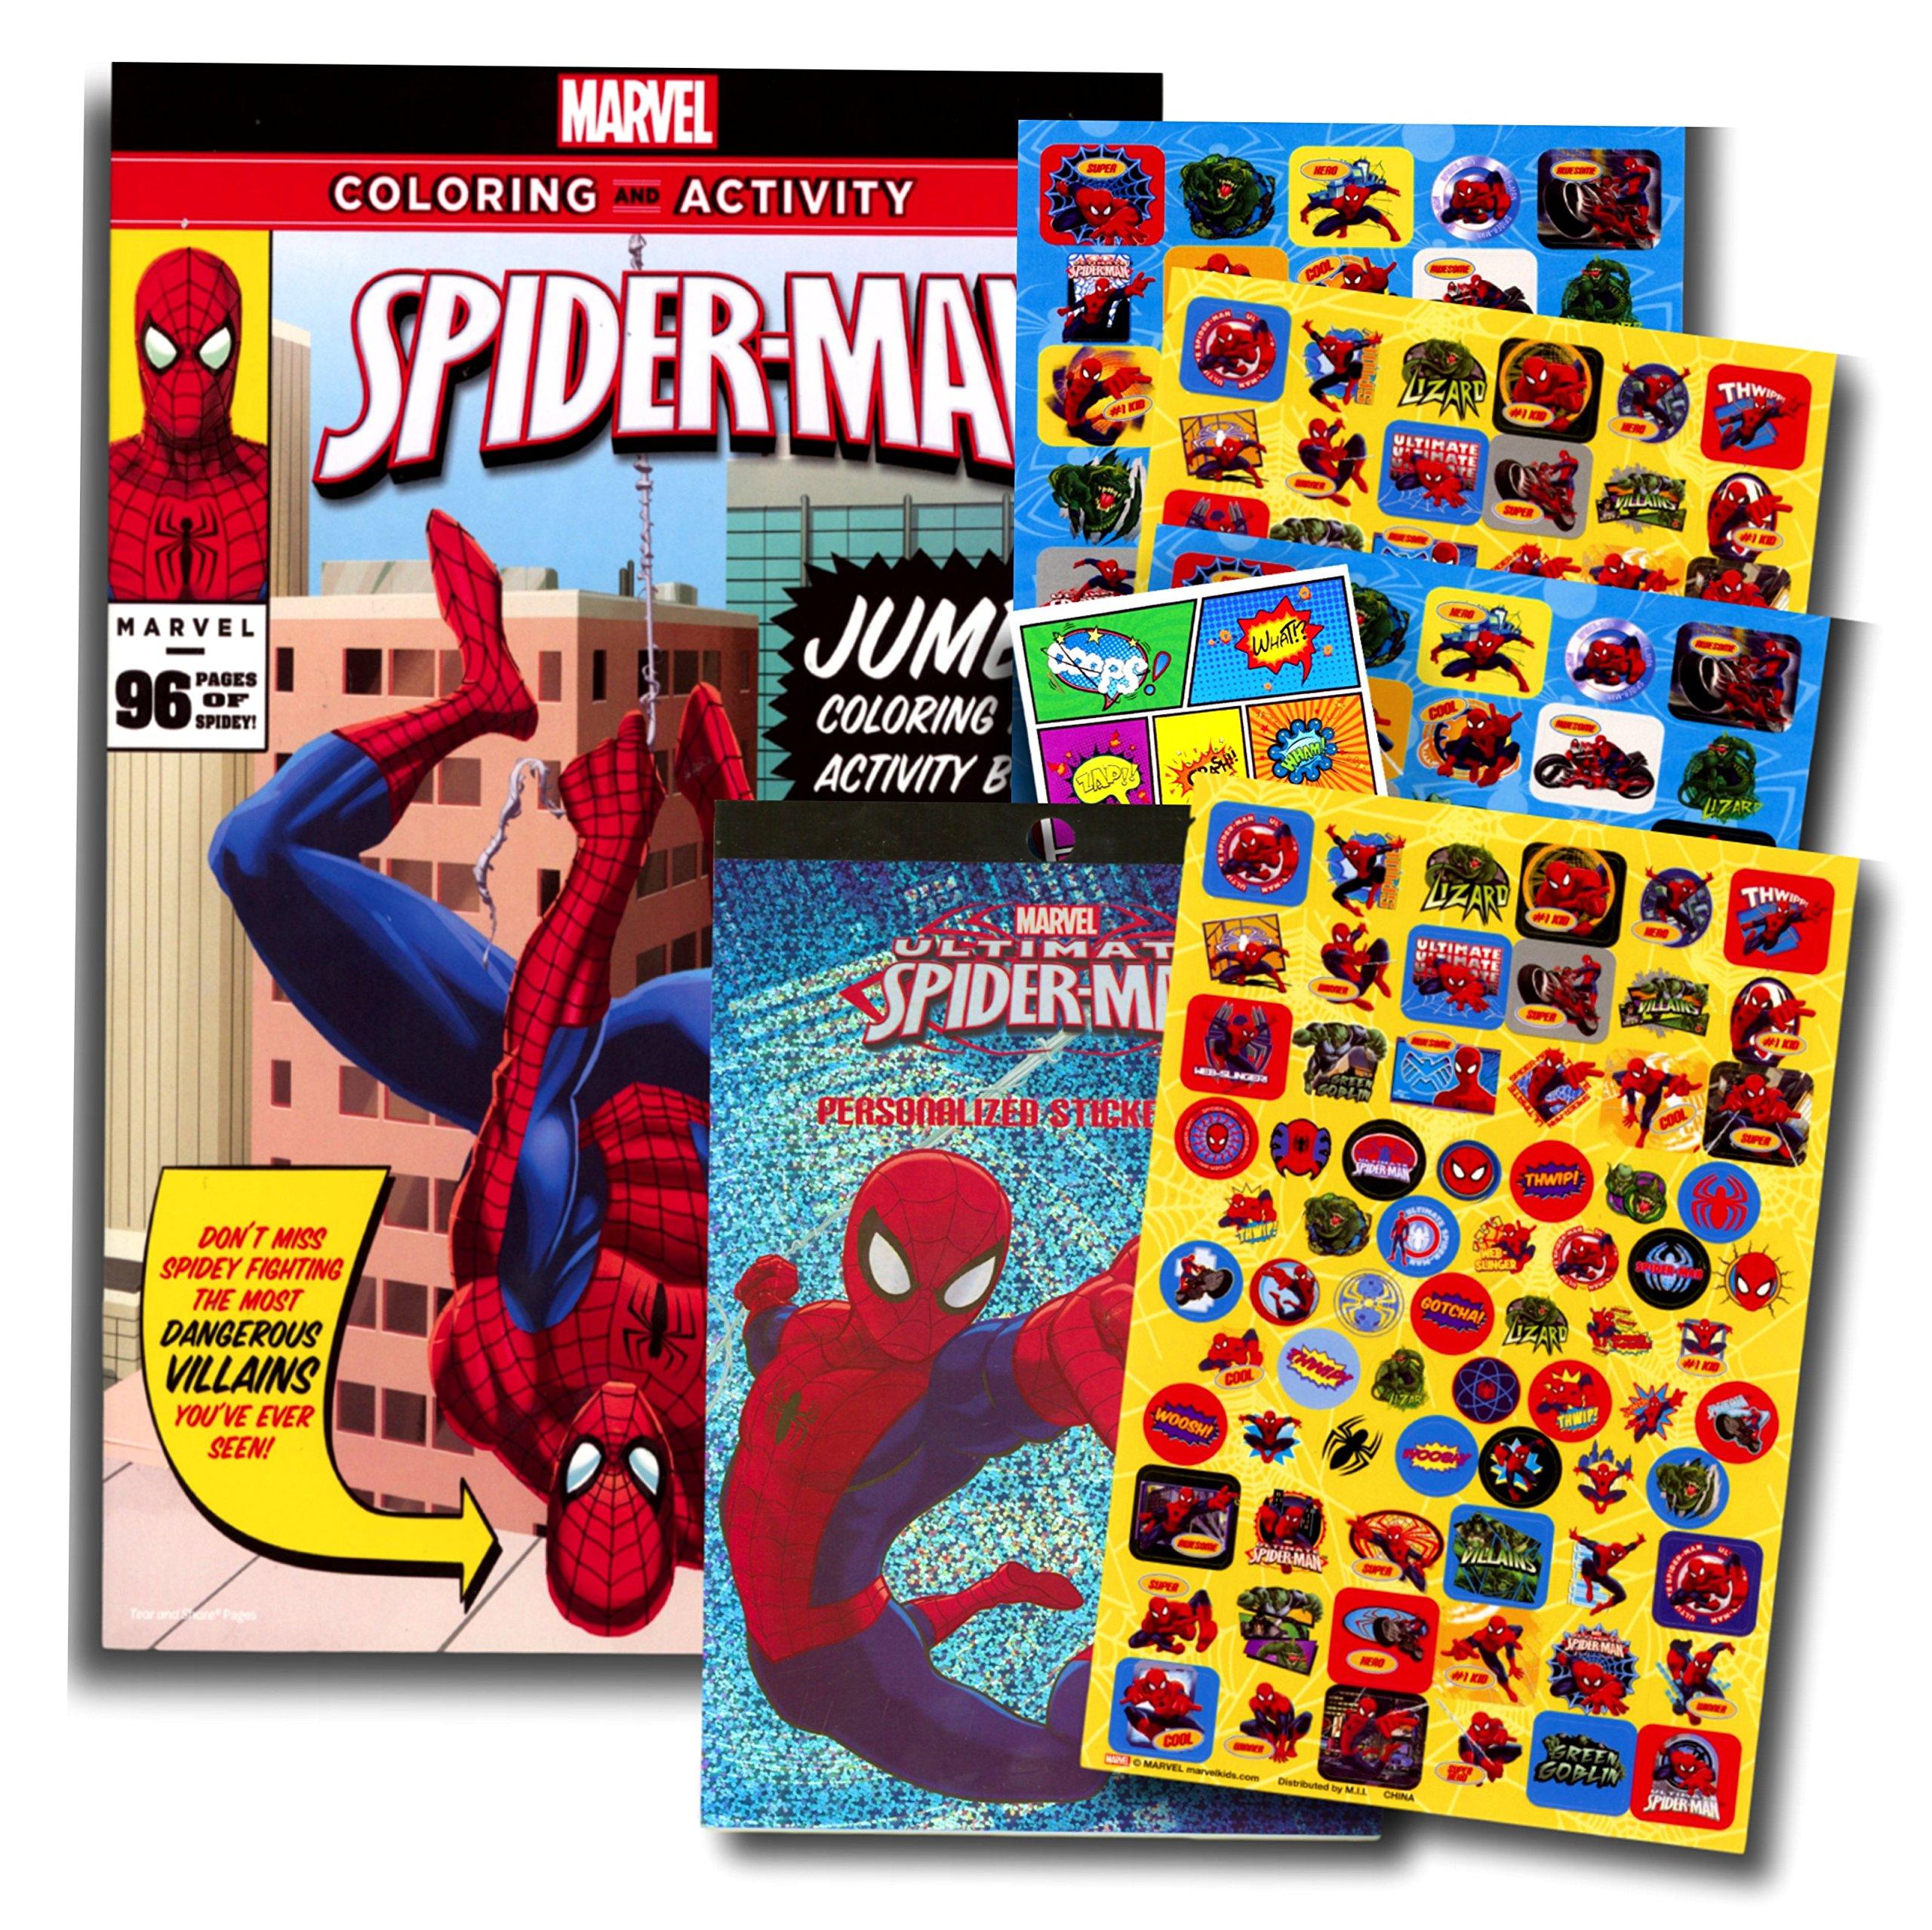 Amazon Marvel Spiderman Coloring Book With Over 270 Stickers Bonus Superhero Sticker Toys Games